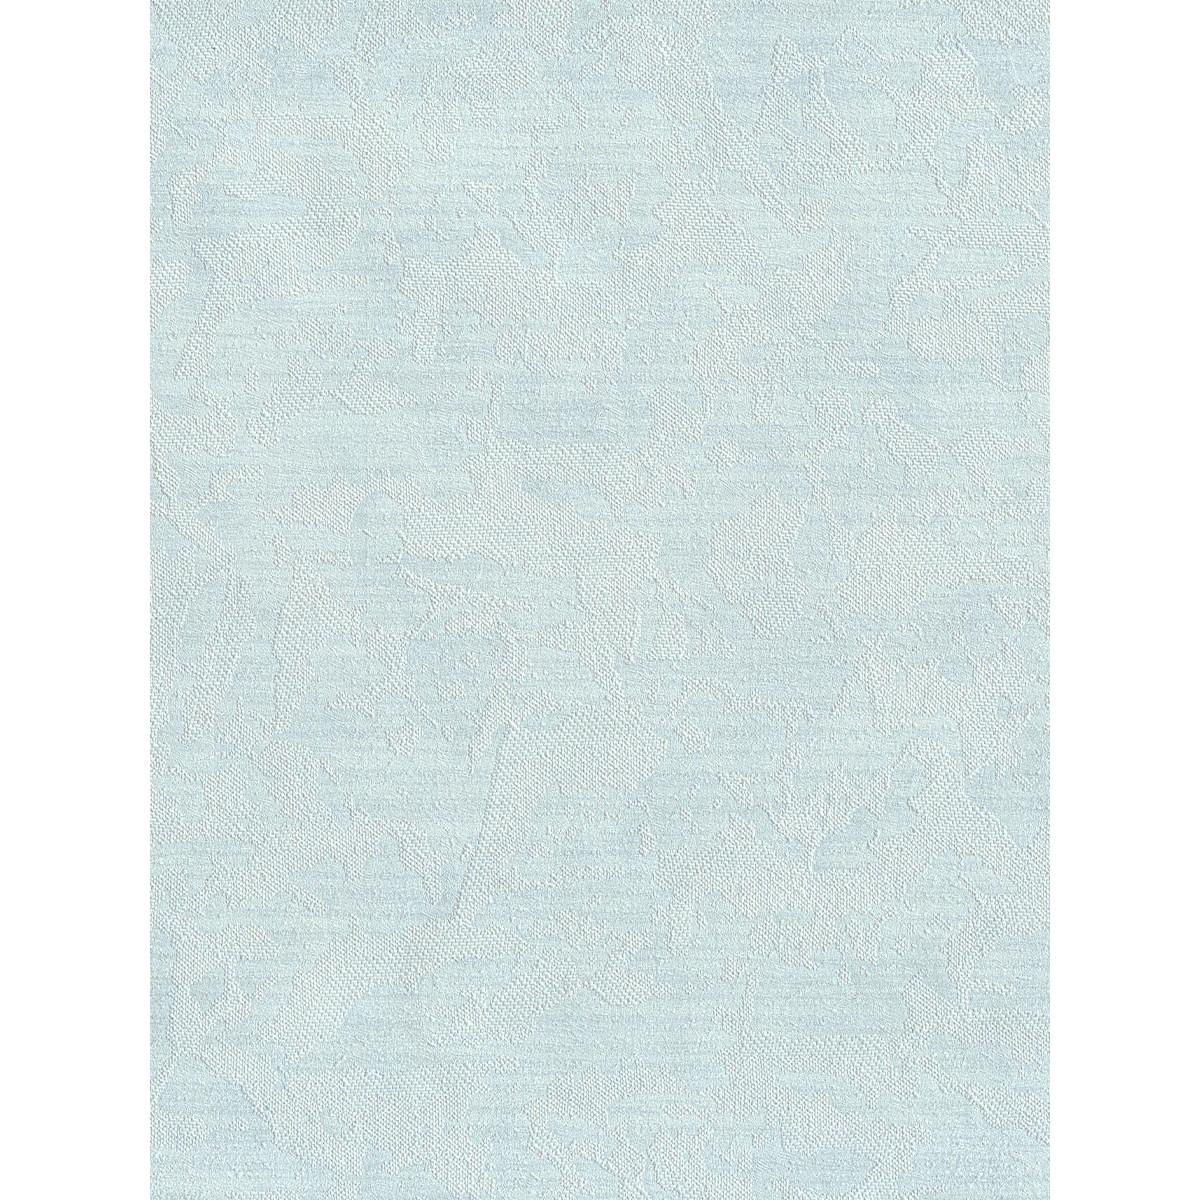 Обои флизелиновые Monte Solaro Crown голубые 9030-03 1.06 м